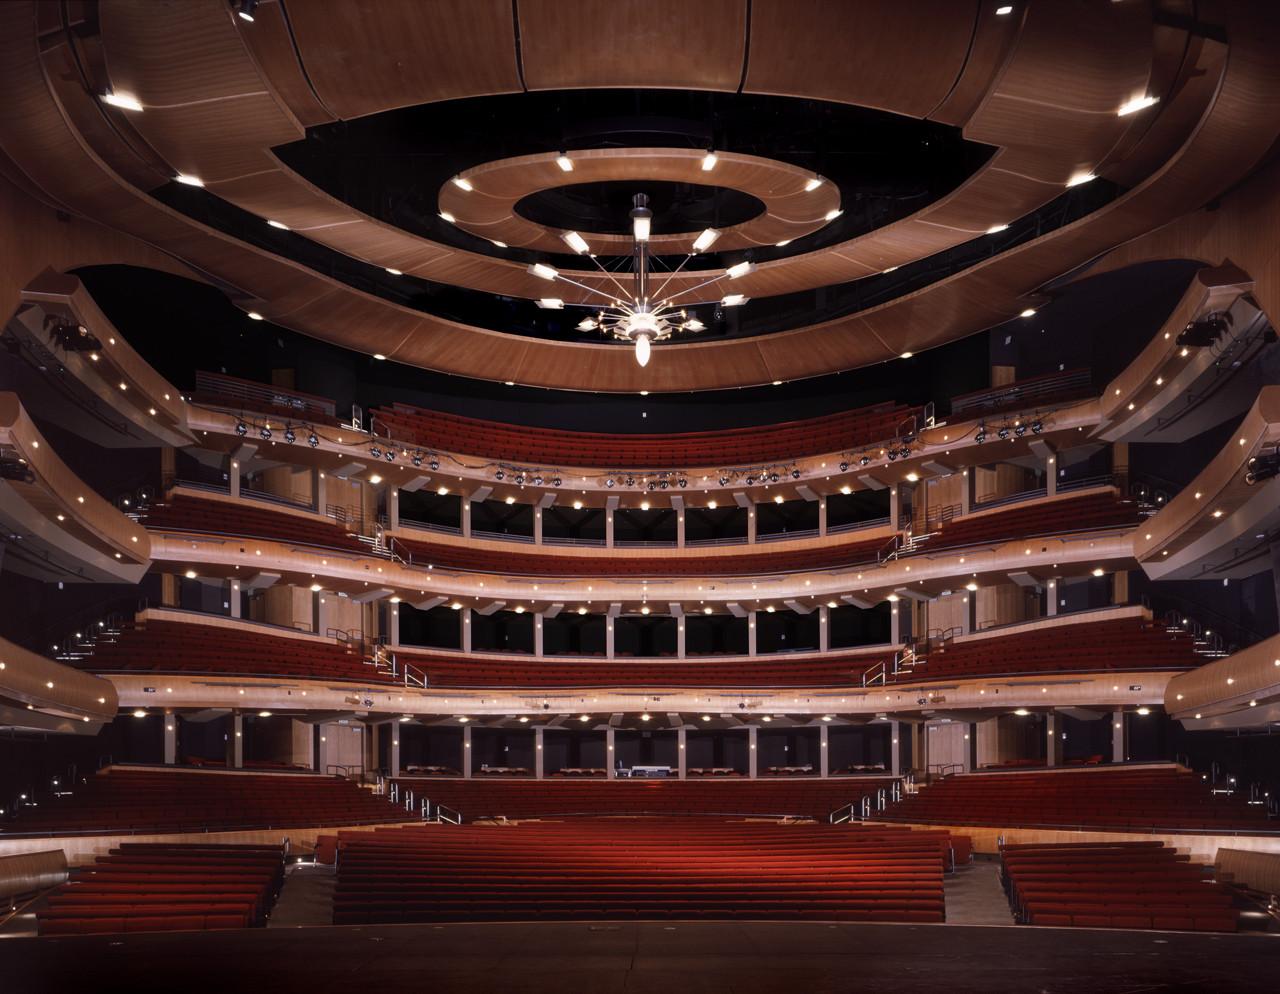 Ellie Caulkins Opera House At The Quigg Newton Auditorium